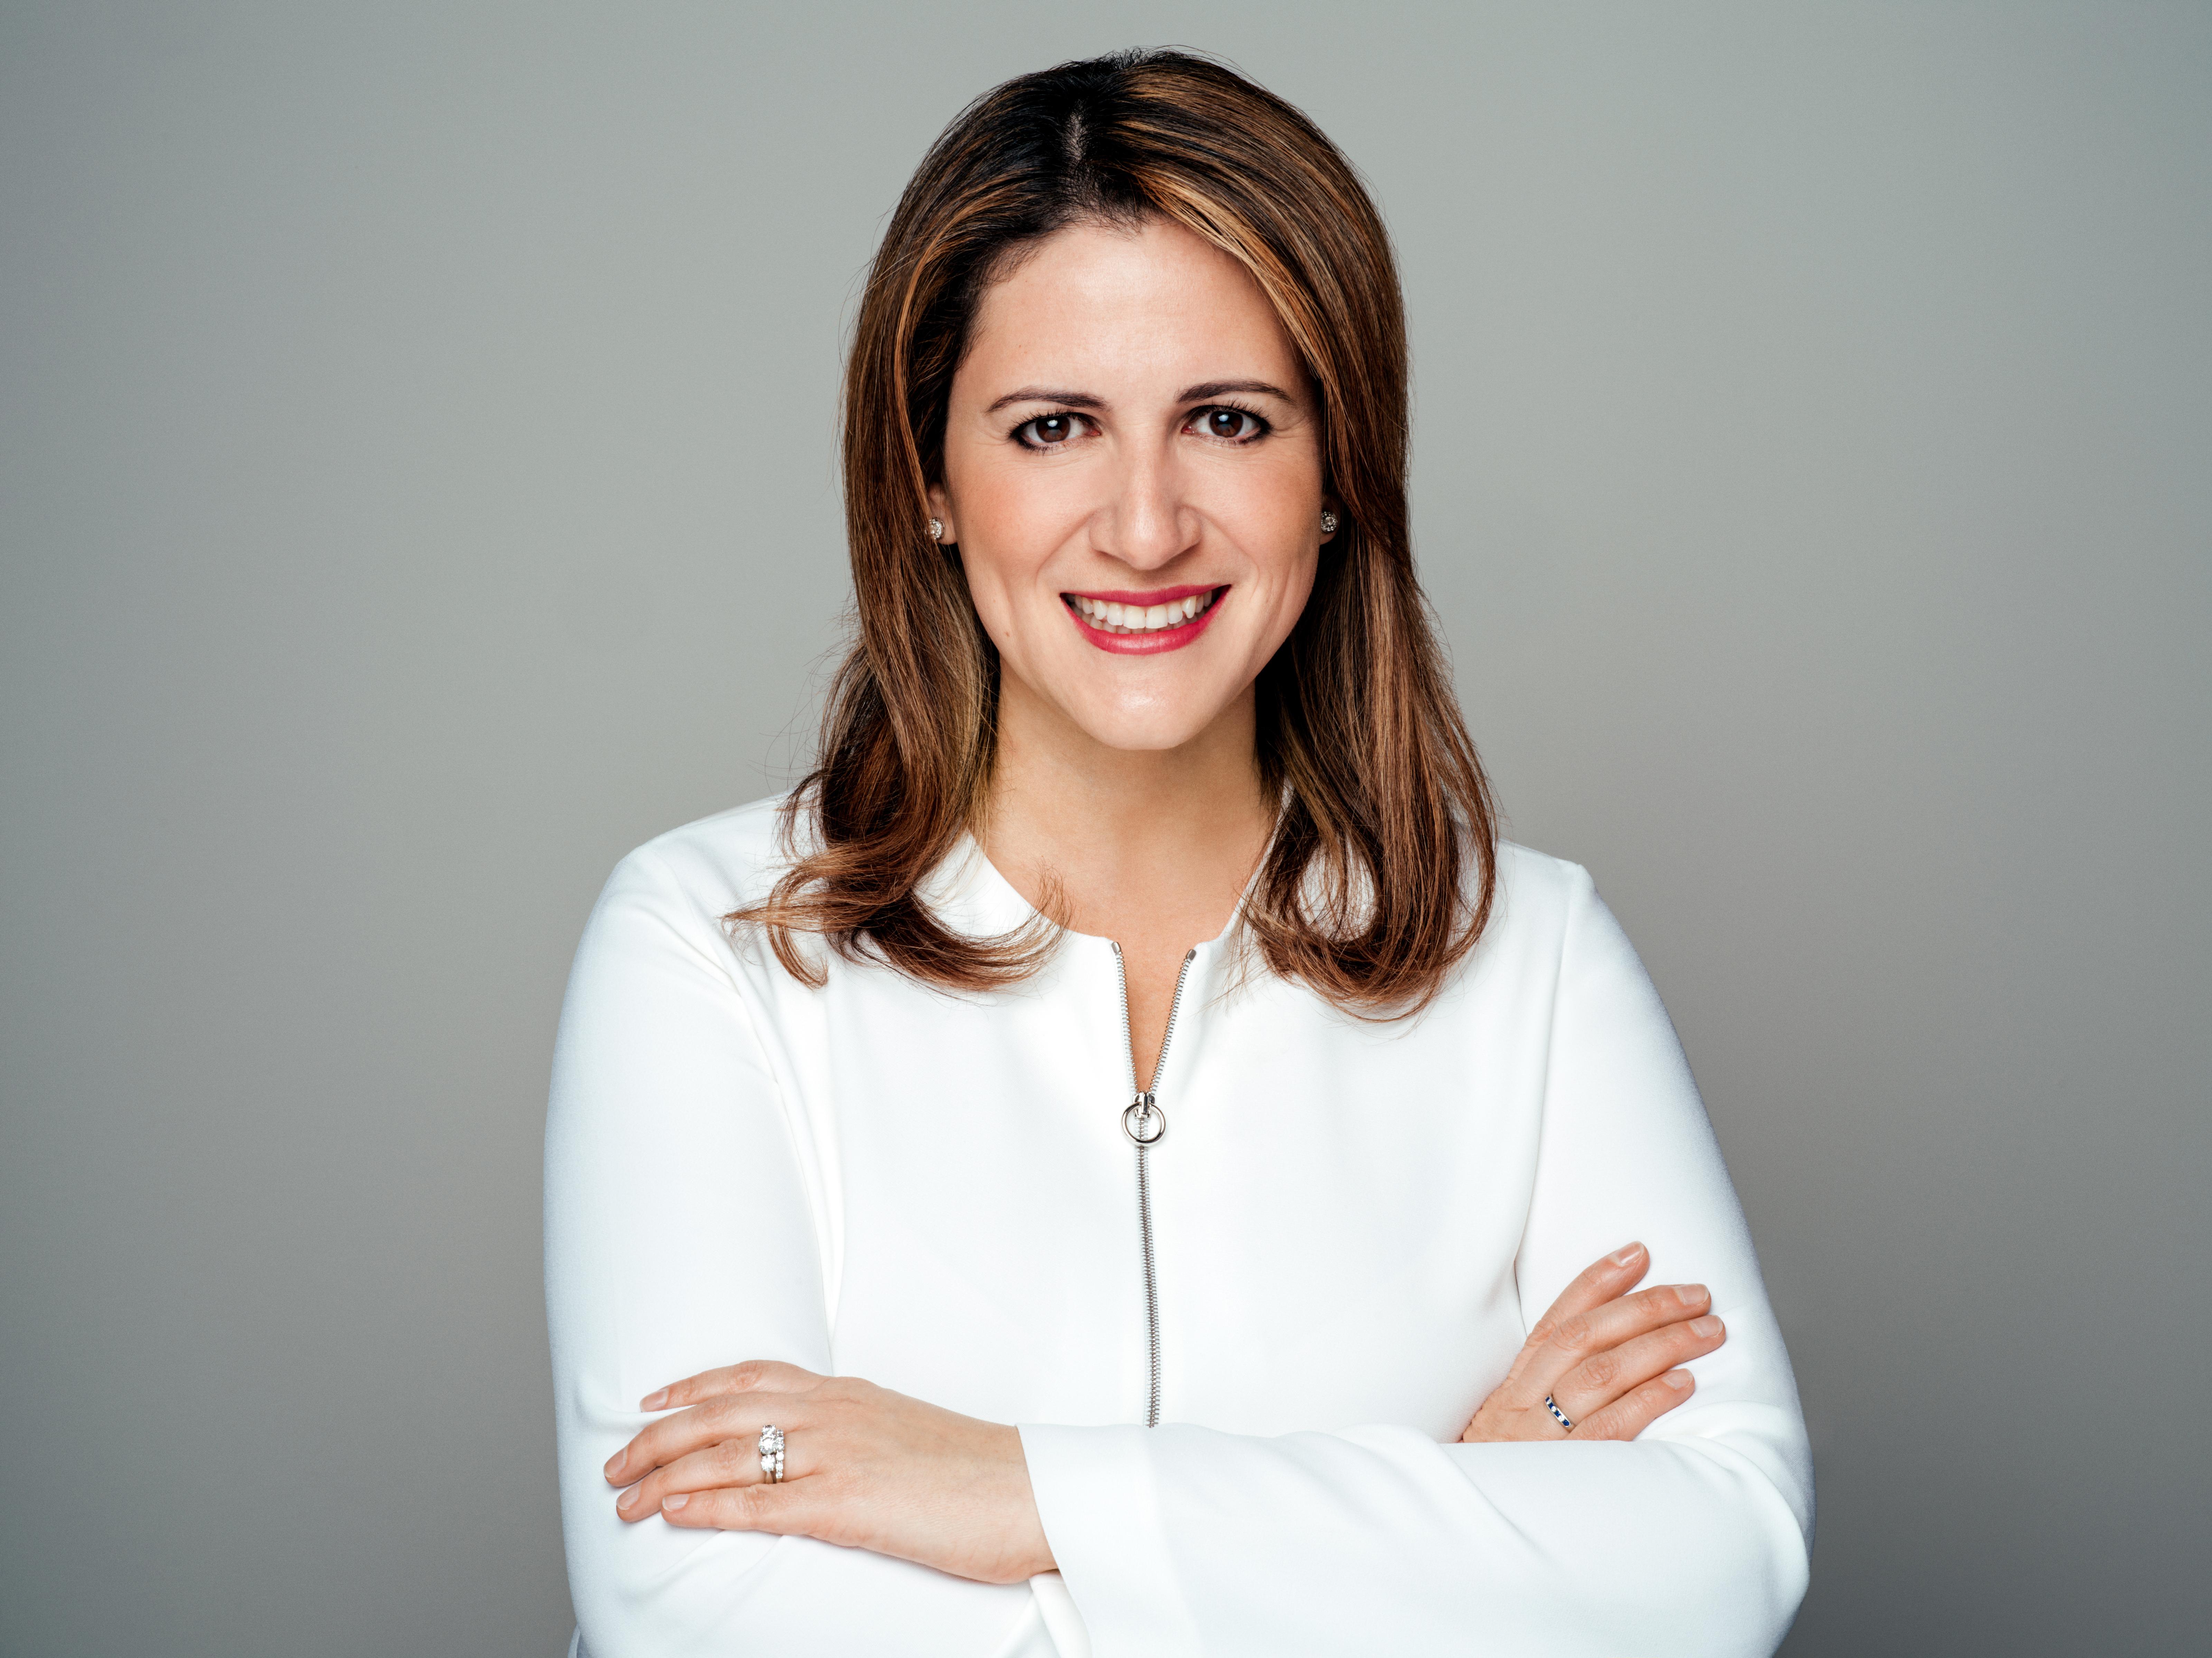 Sonia Sroka - Poderosas - April 2019